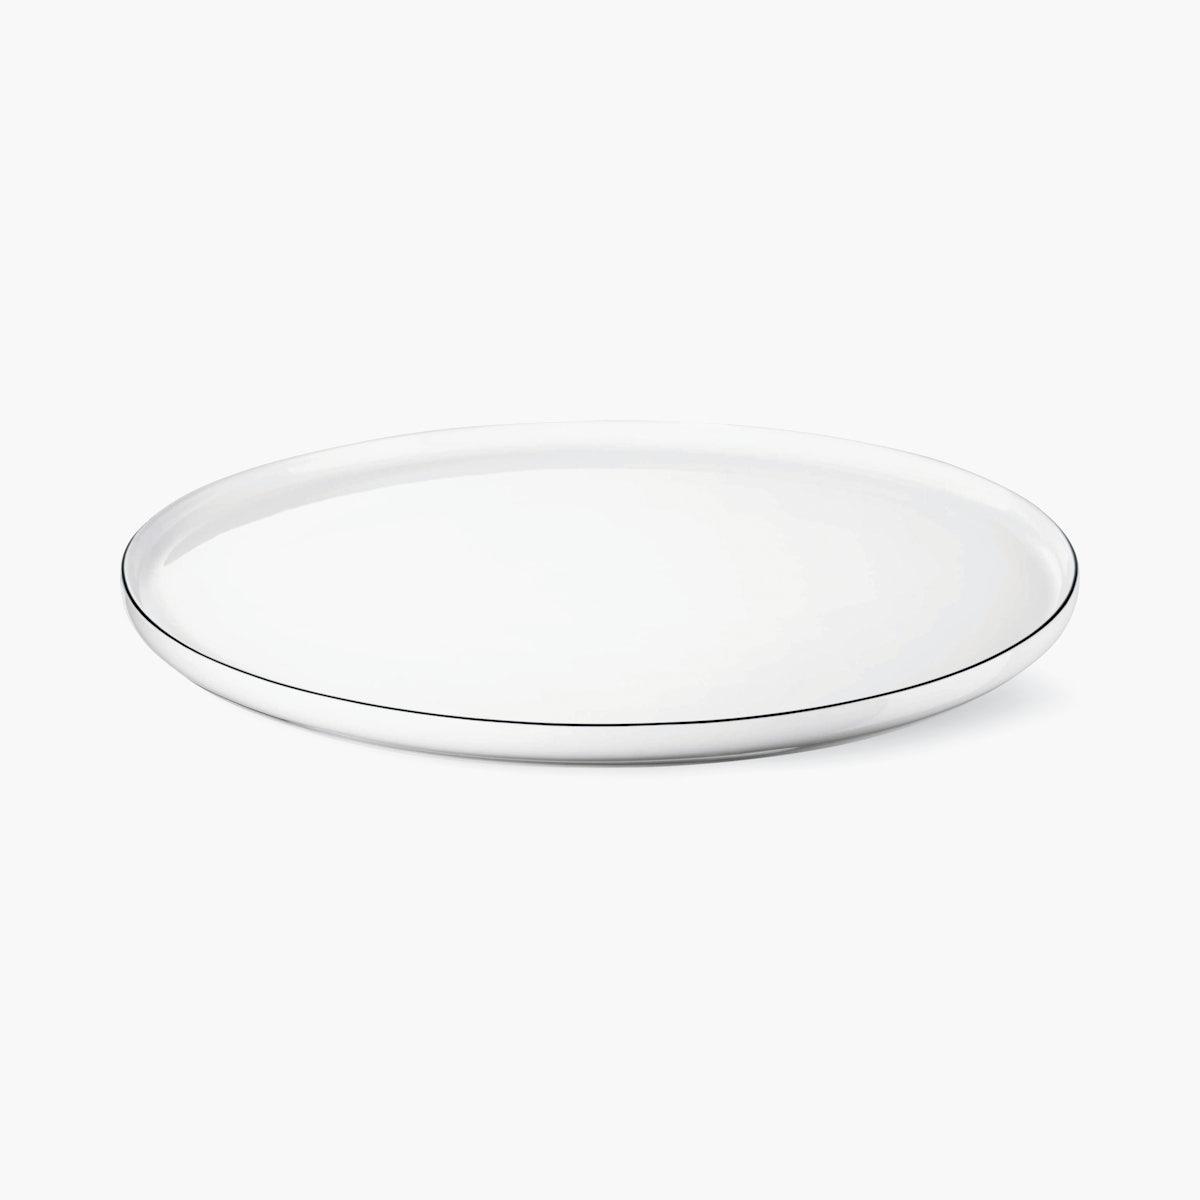 Oco Dinner Plates, Set of 6